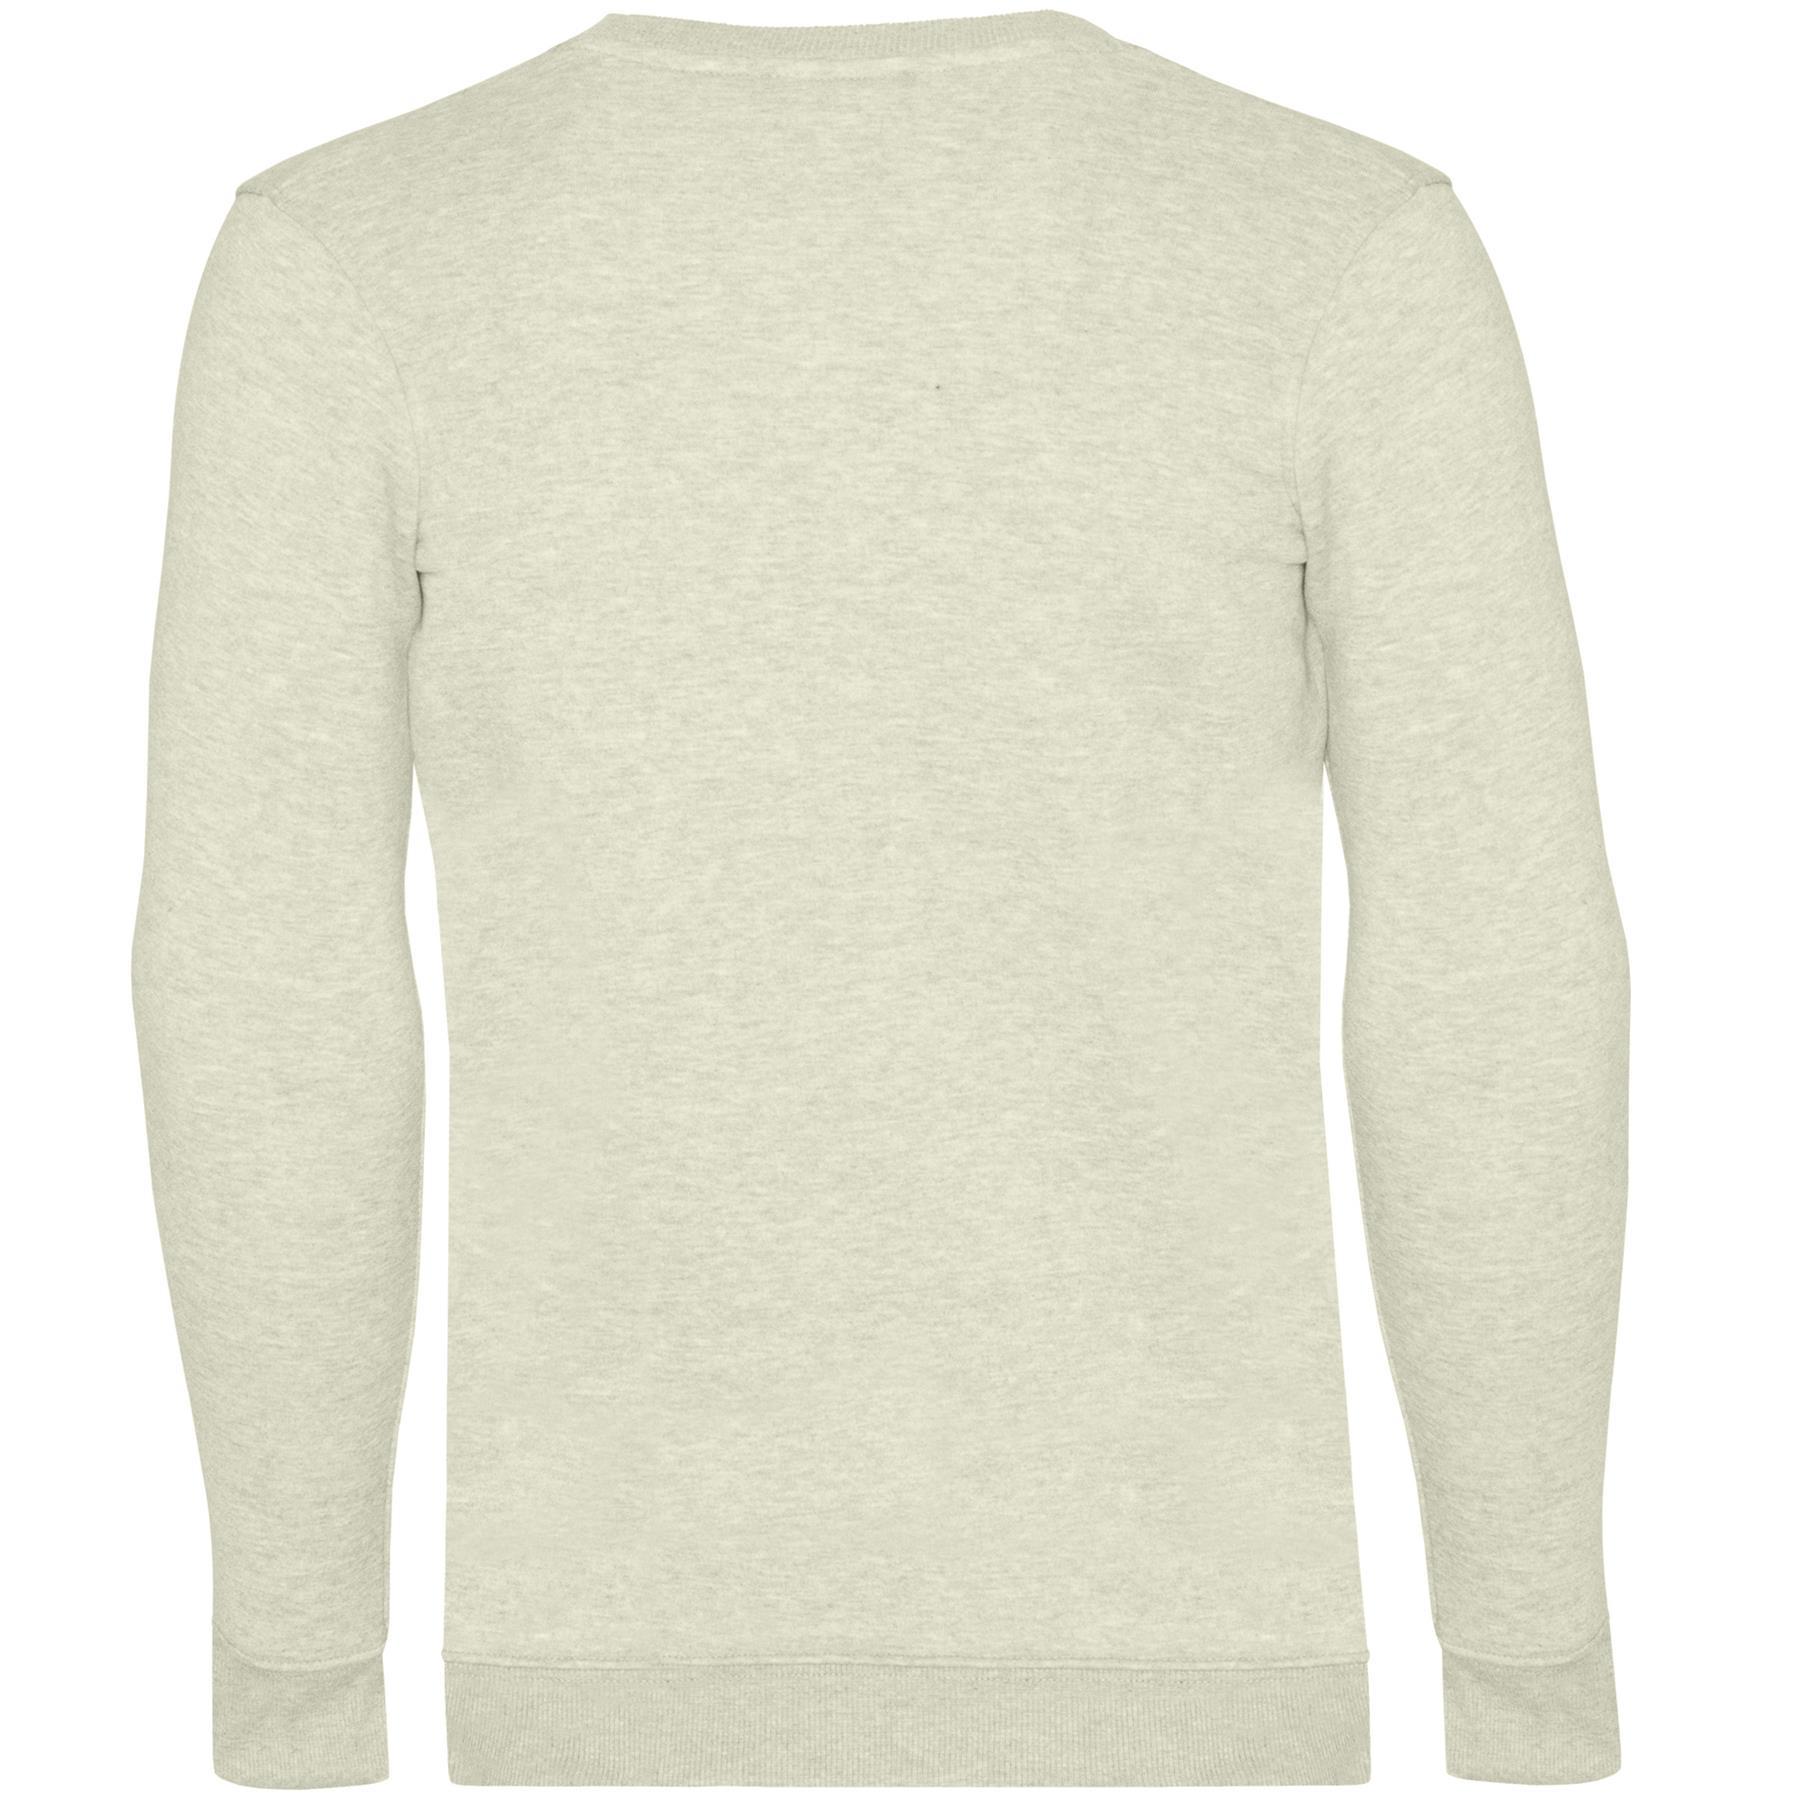 Mens-Jumper-Crew-Neck-Knitwear-Sweatshirt-Casual-Jersey-Fleece-SweatTop-Pullover thumbnail 9